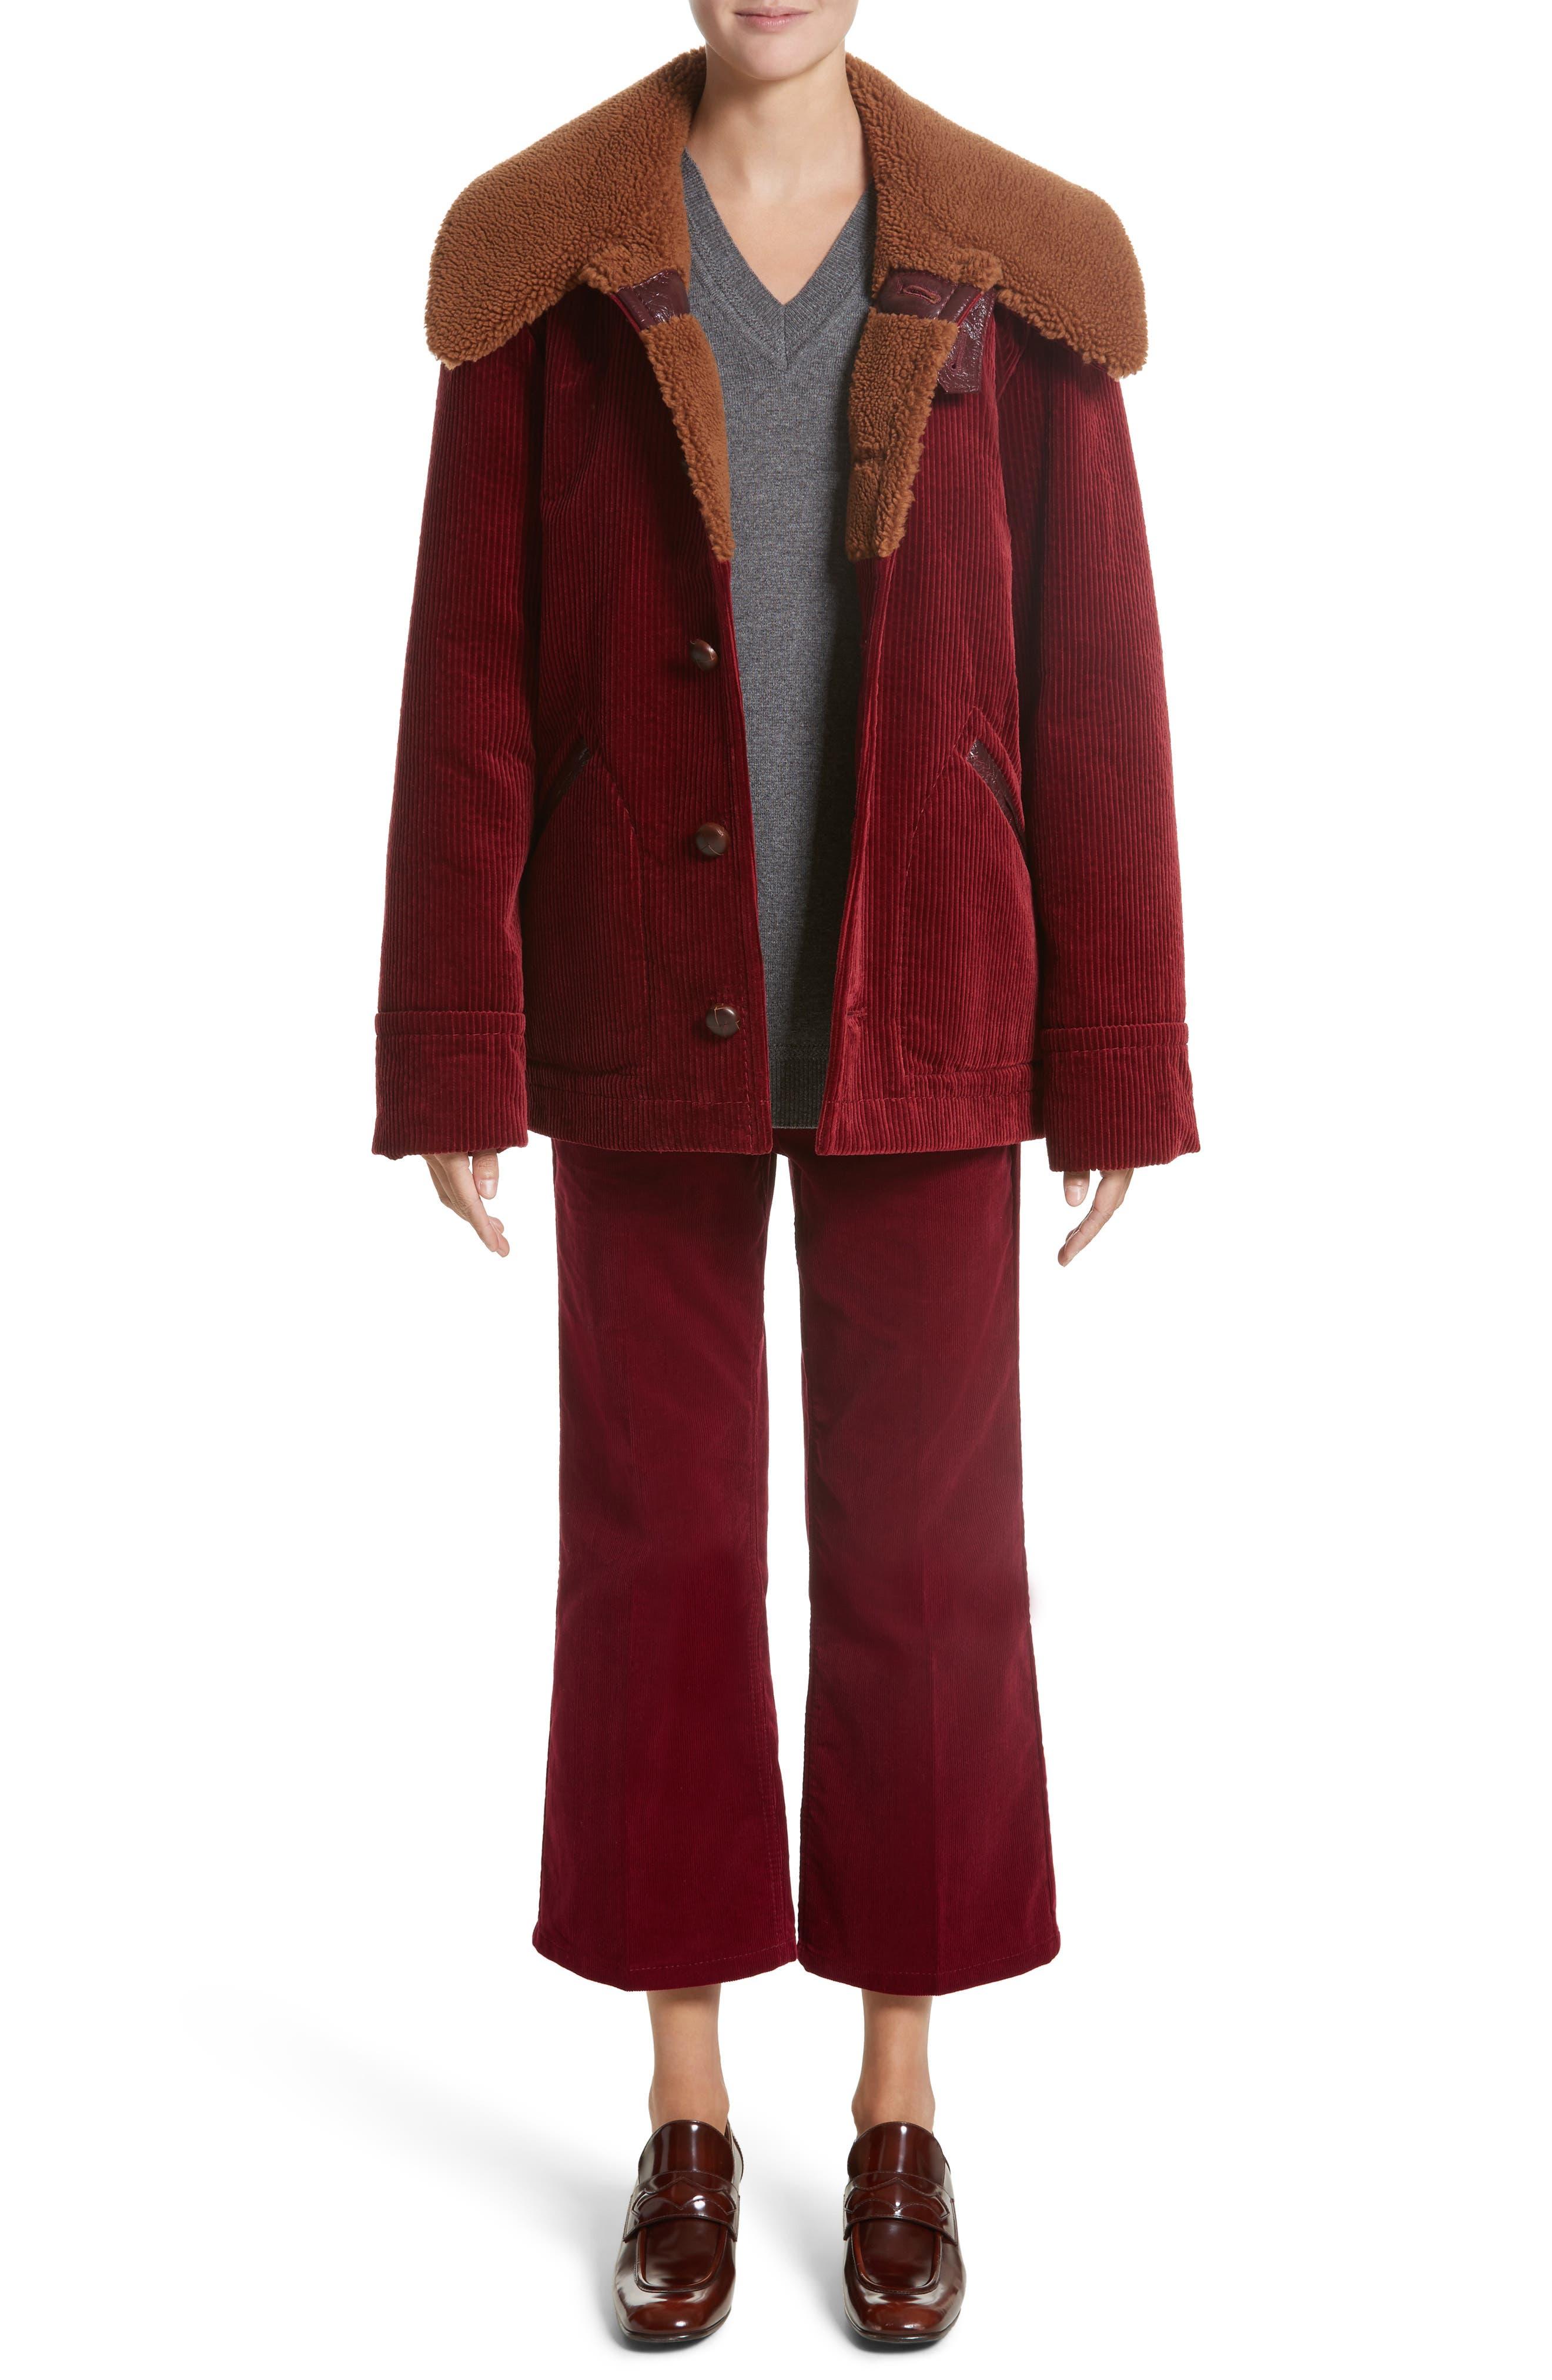 Corduroy Coat with Faux Shearling Collar,                             Alternate thumbnail 8, color,                             Bordeaux